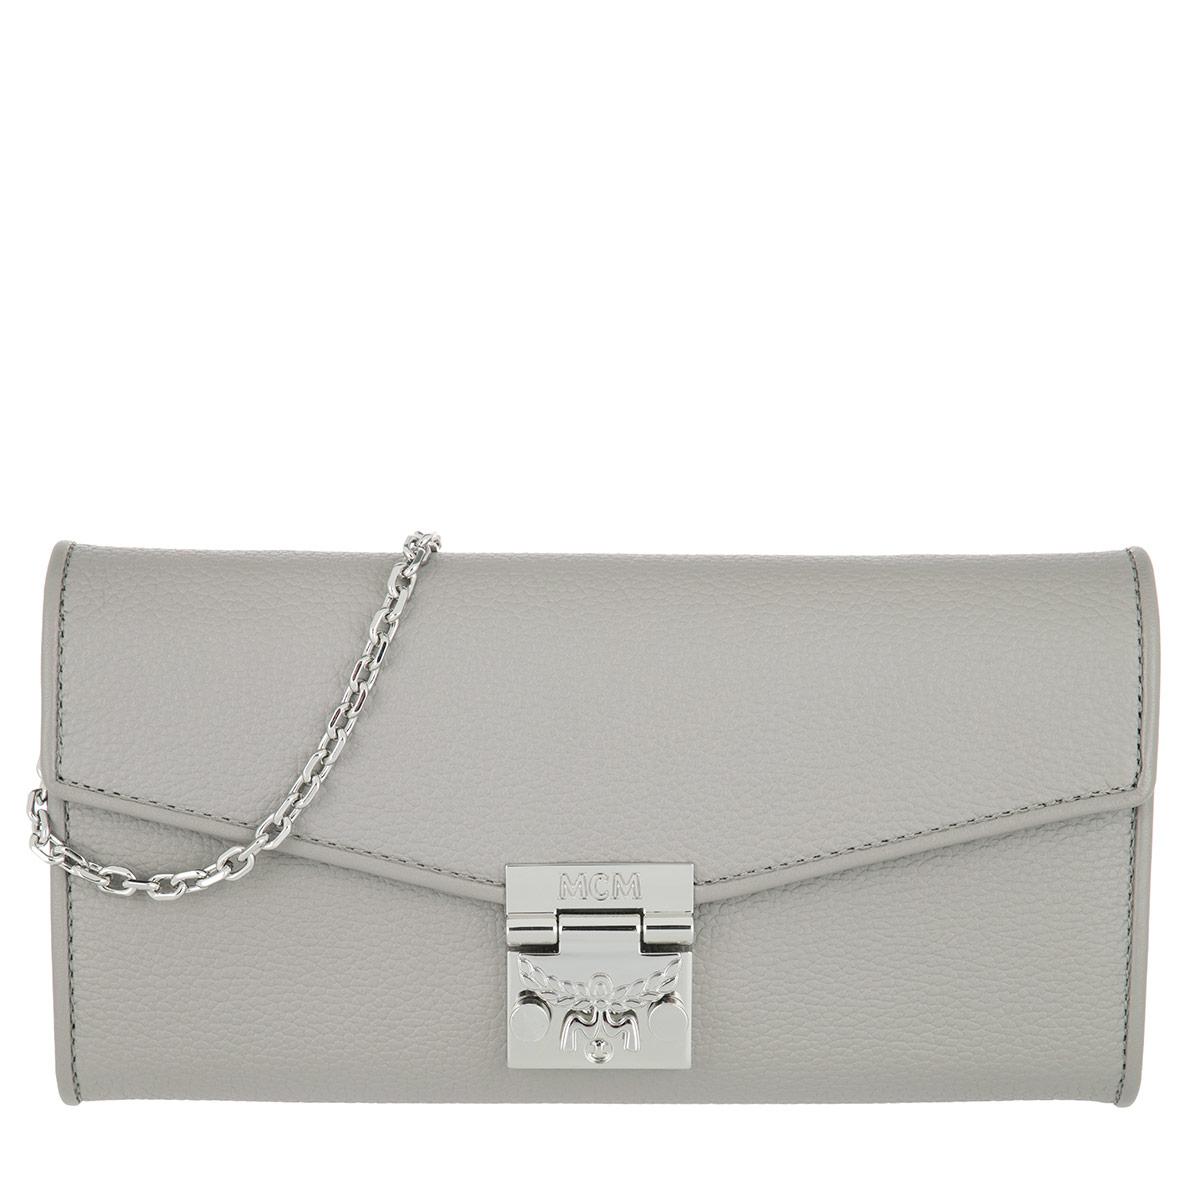 MCM Portemonnaie - Patricia Park Avenue Flap Wallet Two-Fold Large Arch Grey - in grau - für Damen